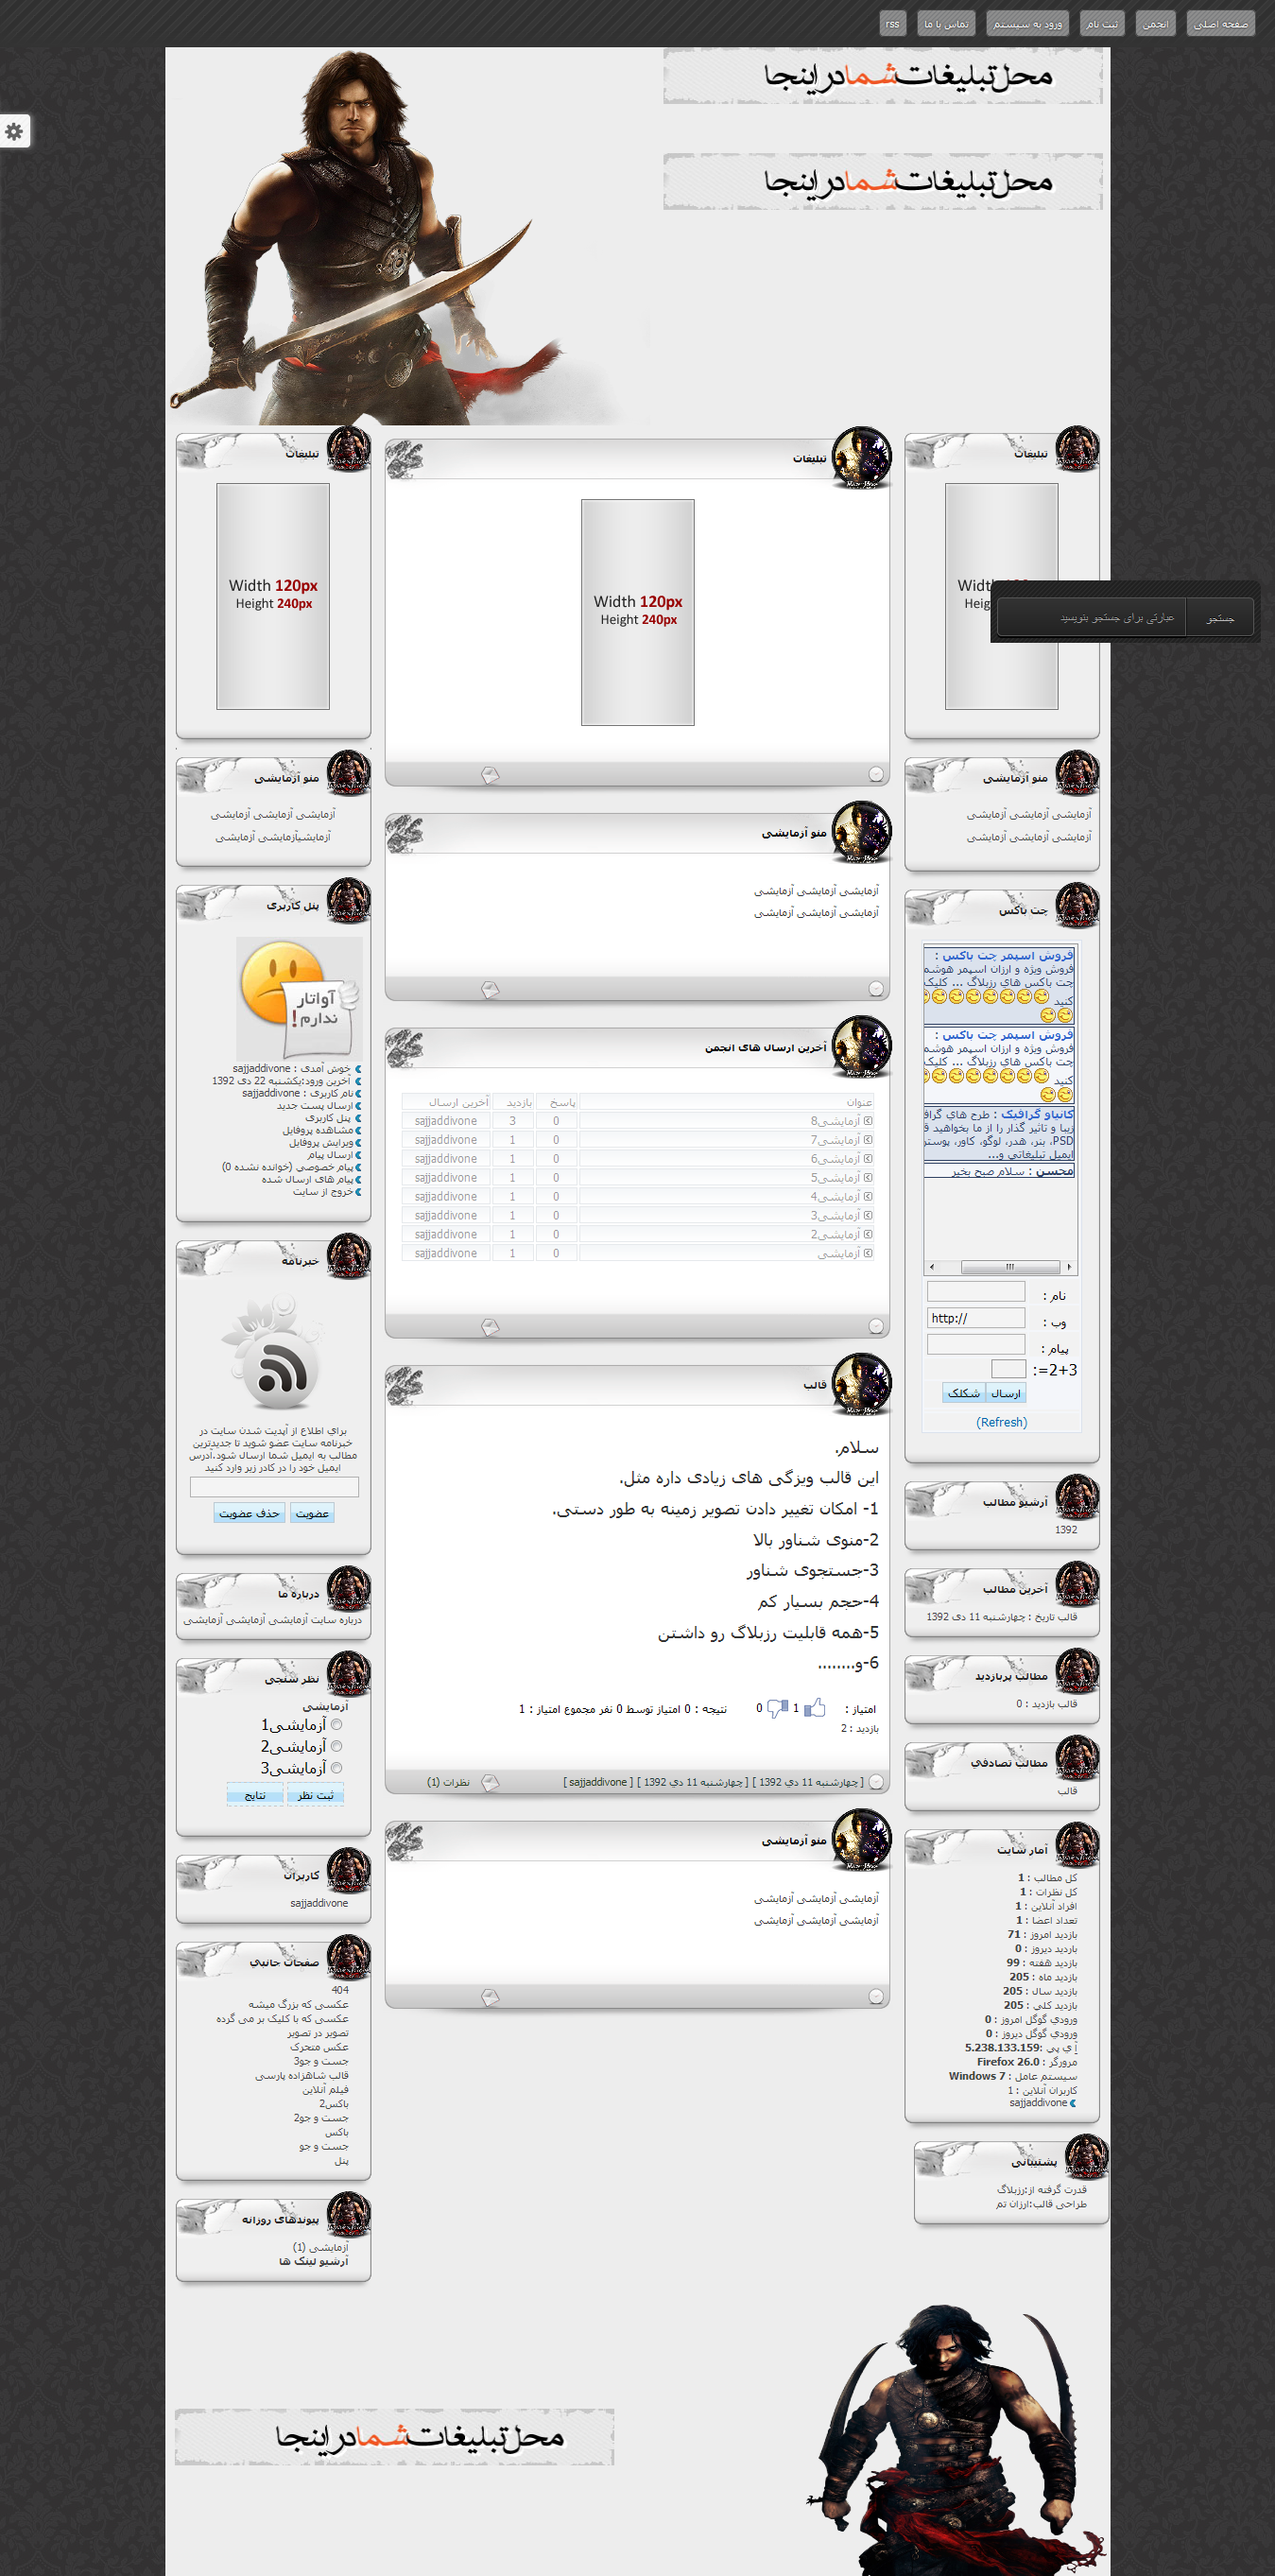 قالب پرنس آف پرشین برای رزبلاگ